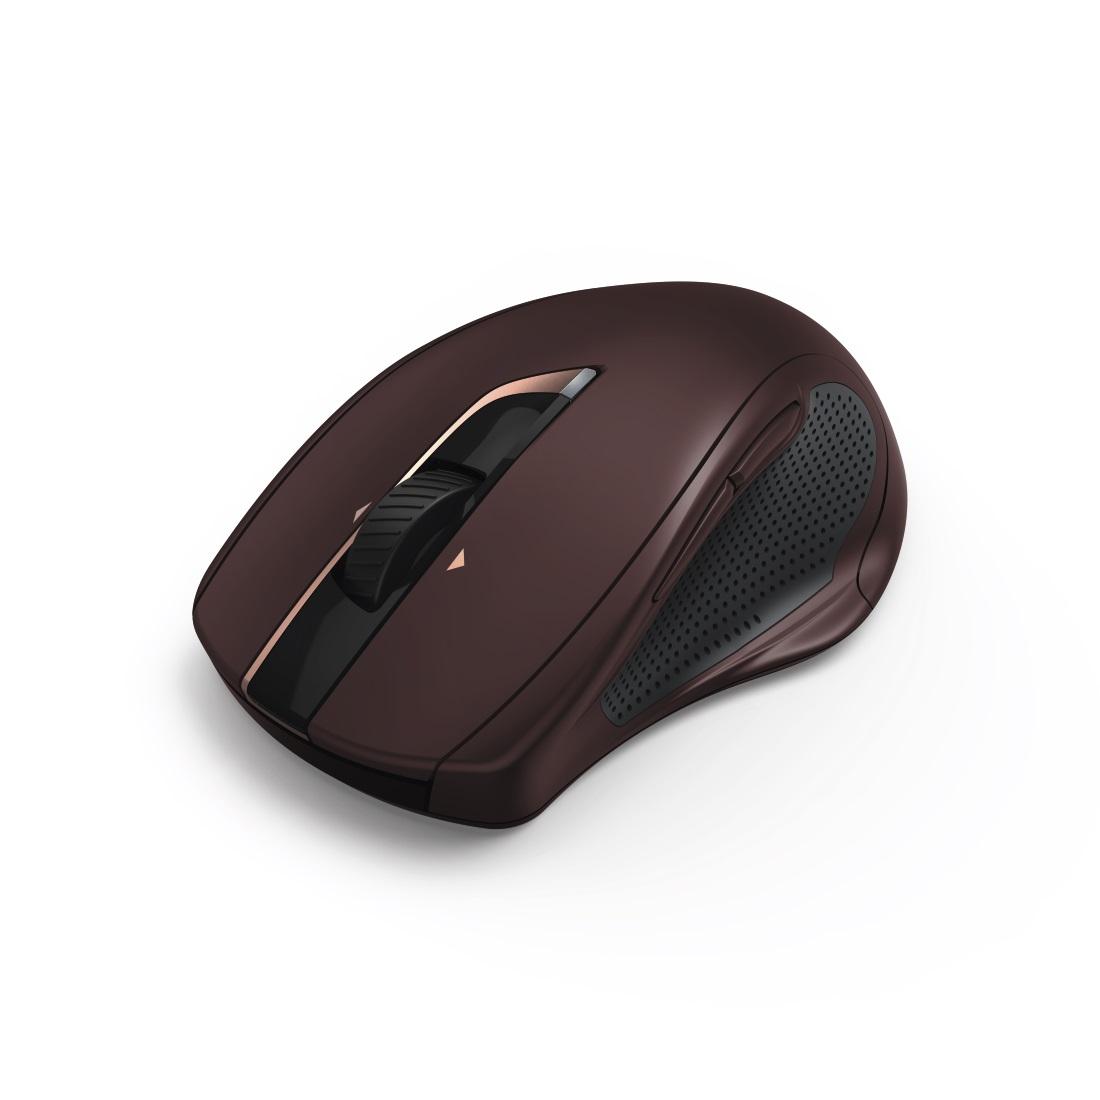 HAMA MW-800 7-Button Laser Wireless Mouse Auto-dpi burgundy